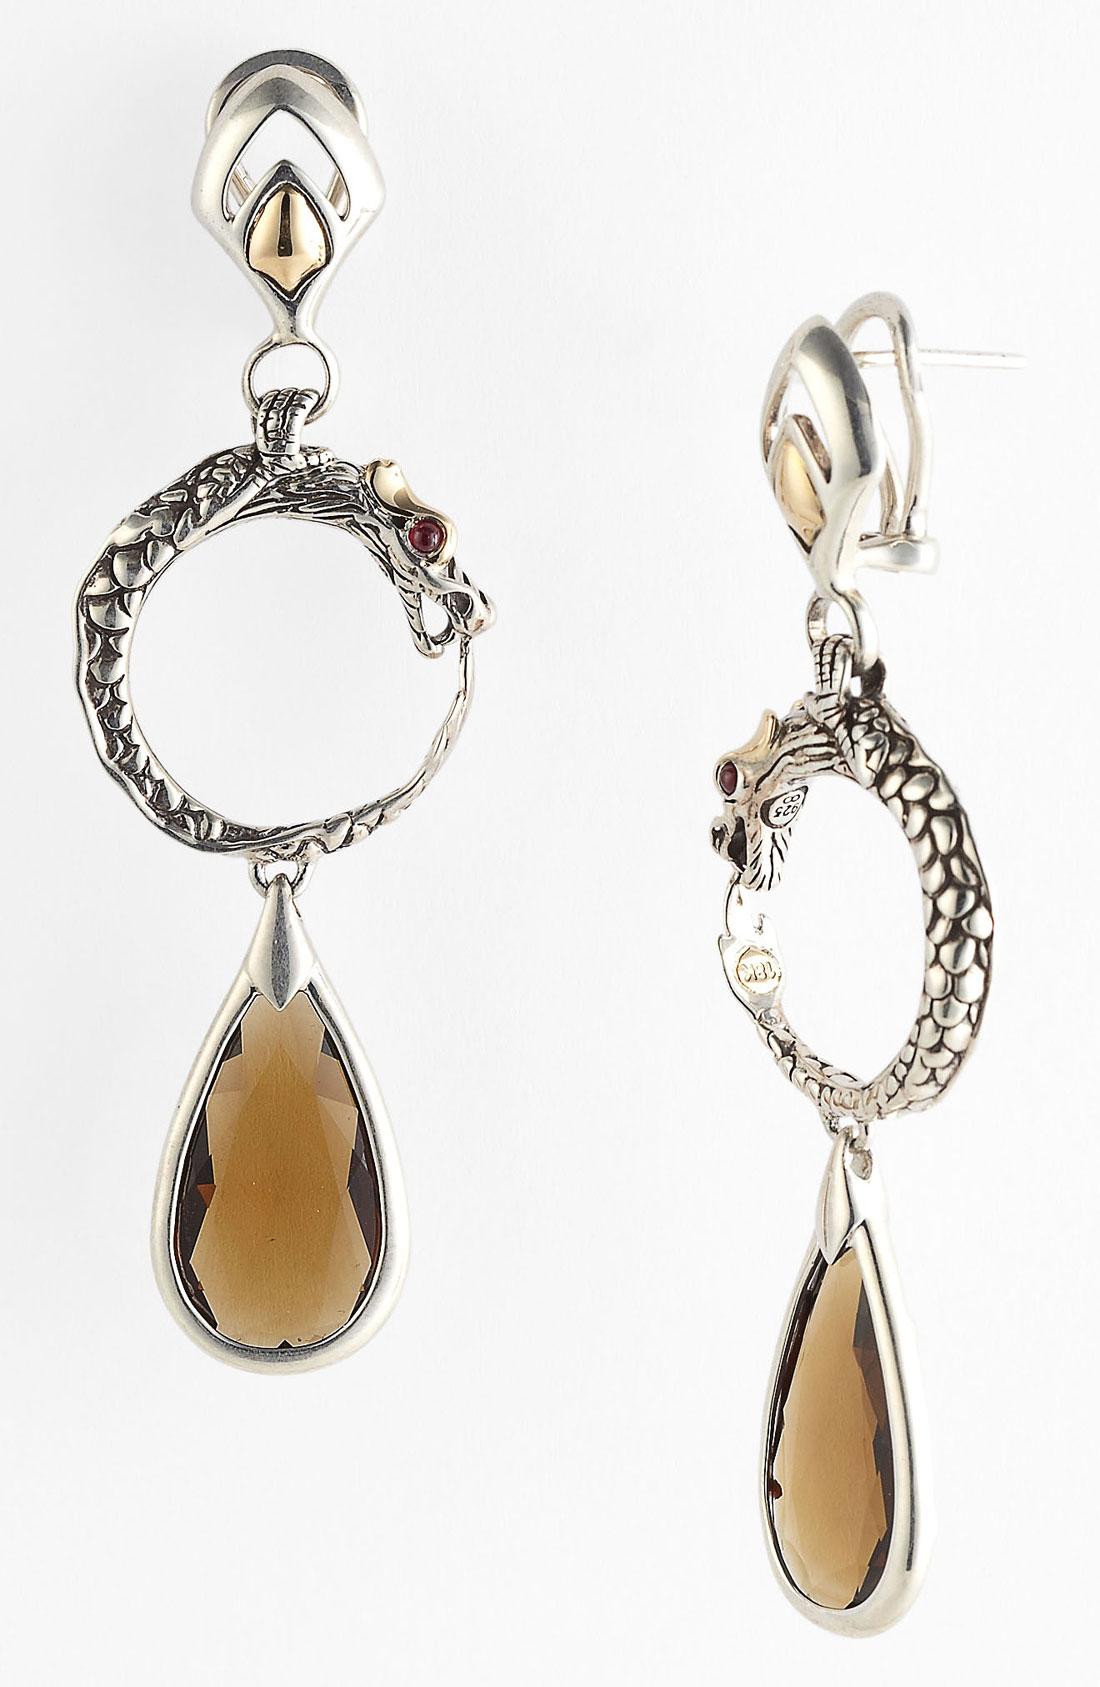 John hardy batu naga drop earrings in silver silver for John hardy jewelry earrings